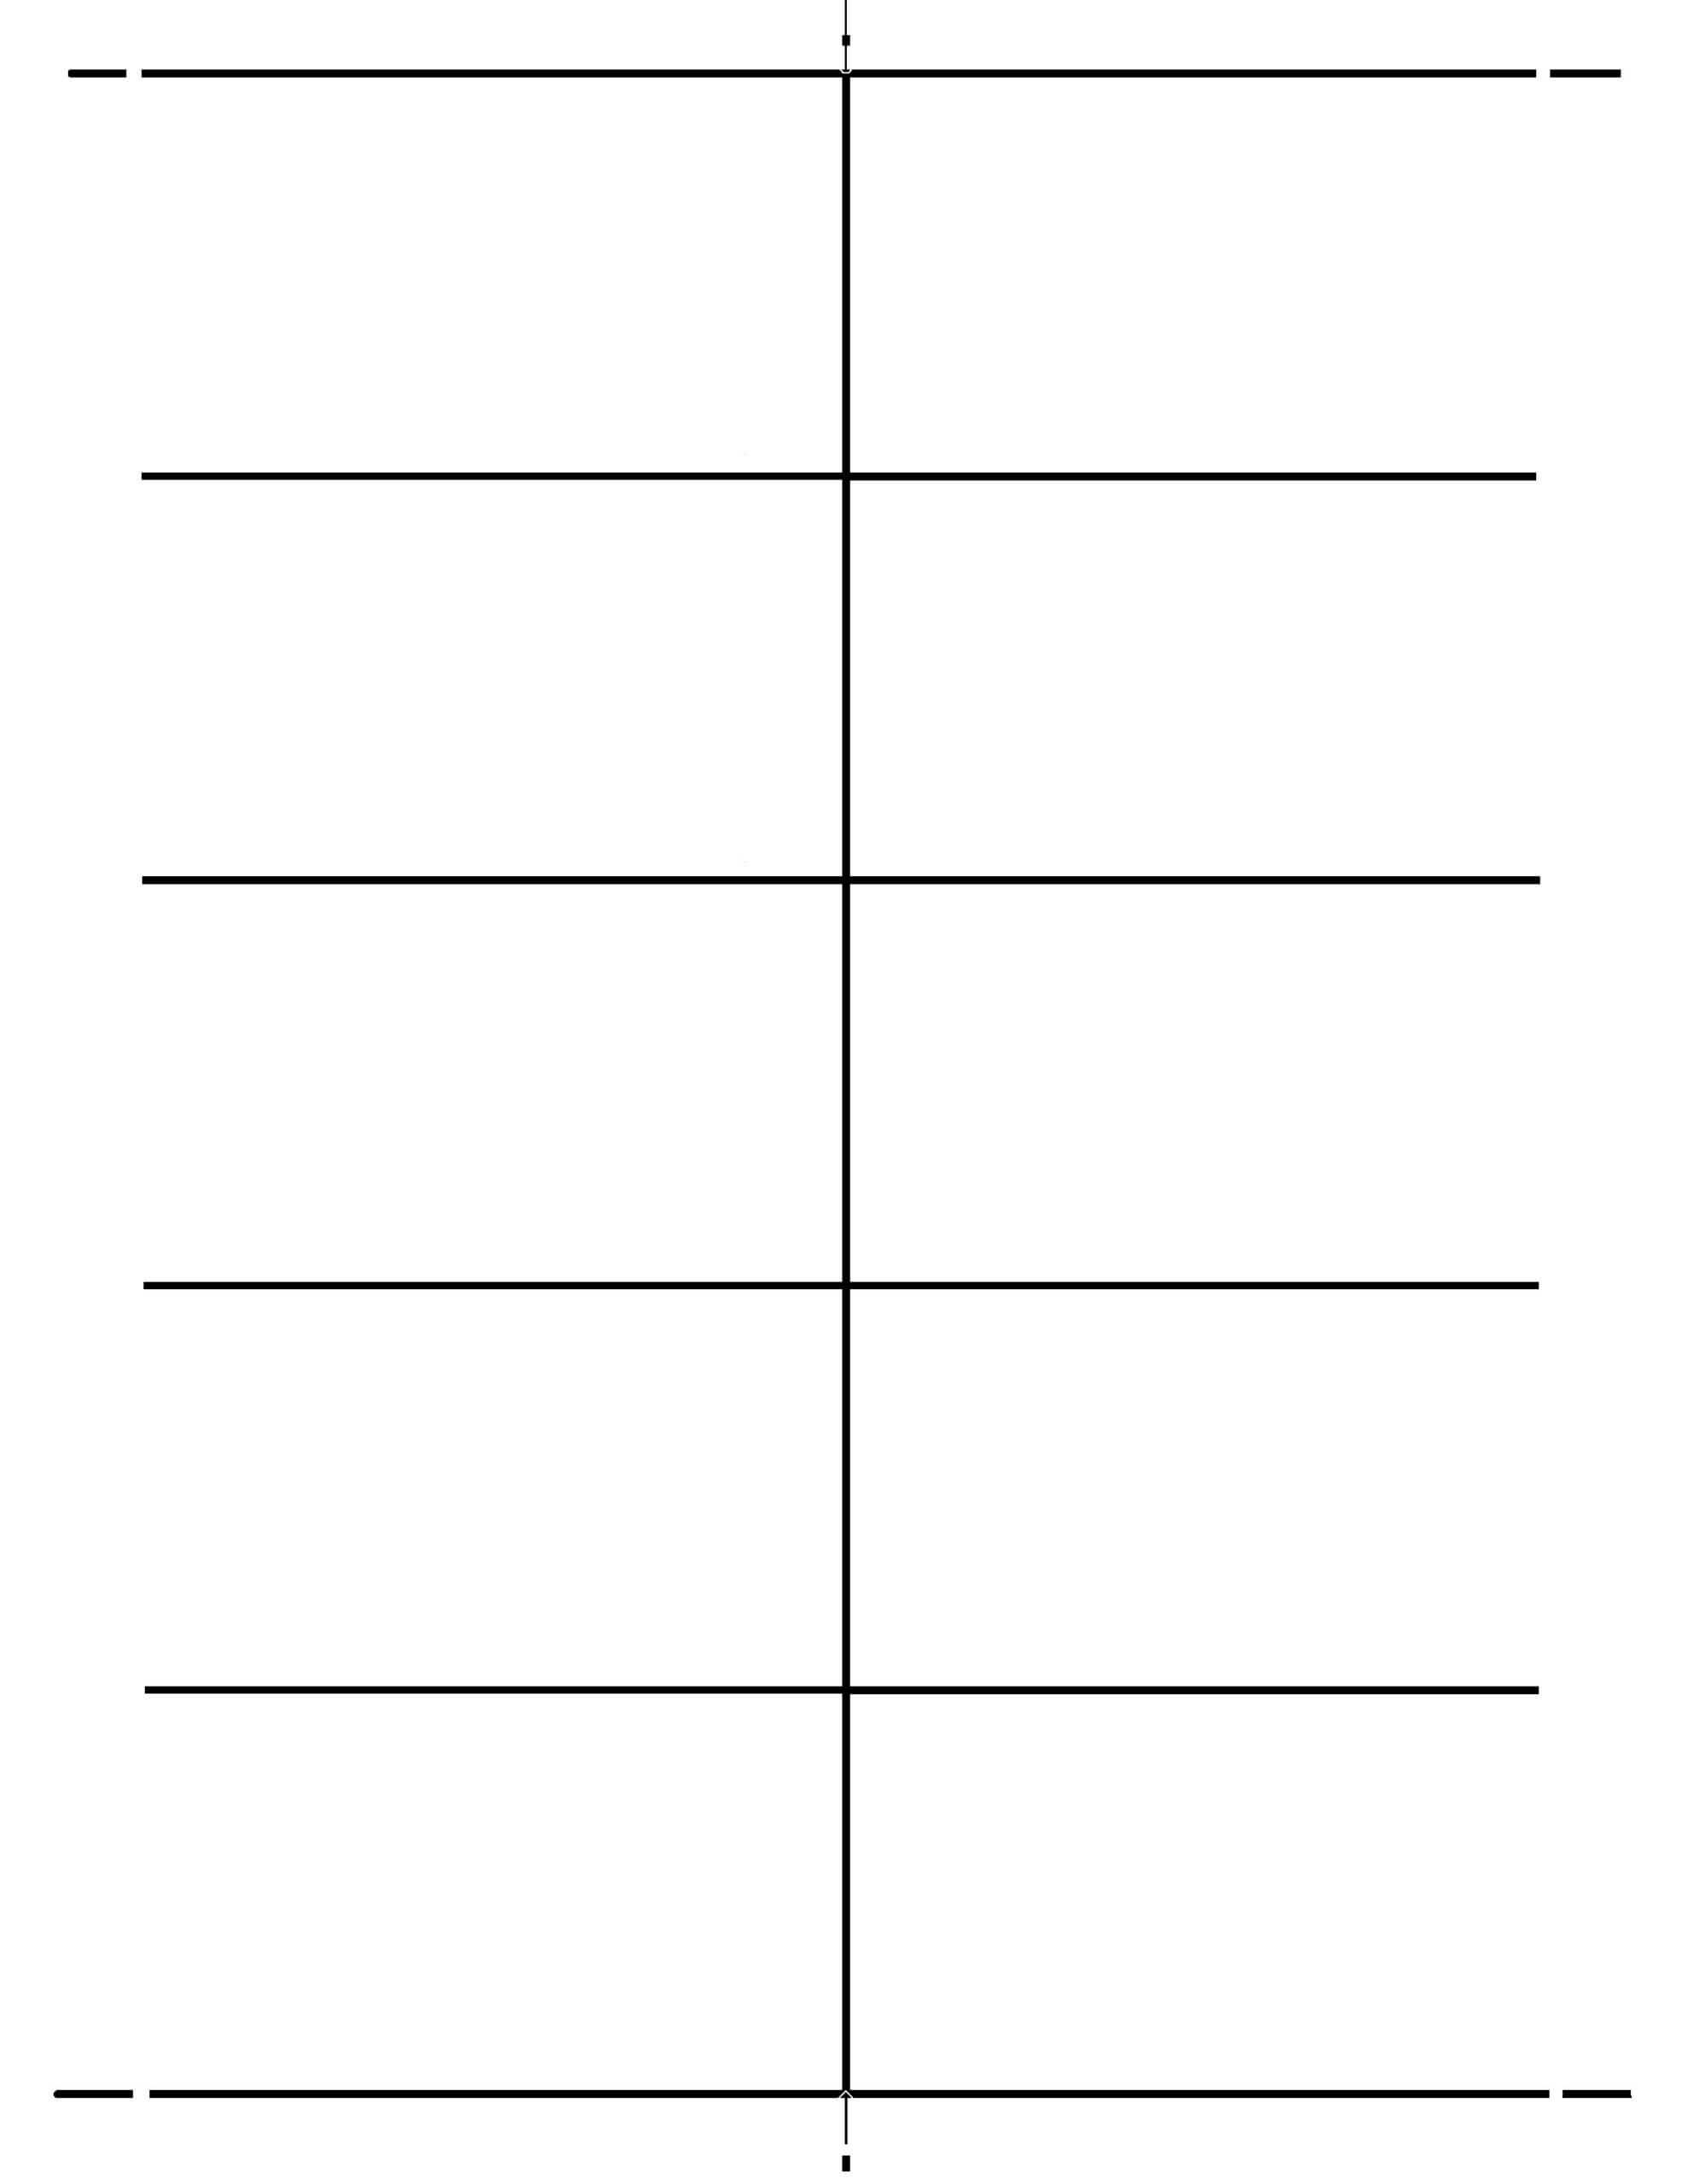 Standard Blank Business Card Template Word Mac Design Regarding Free Blank Business Card Template Word